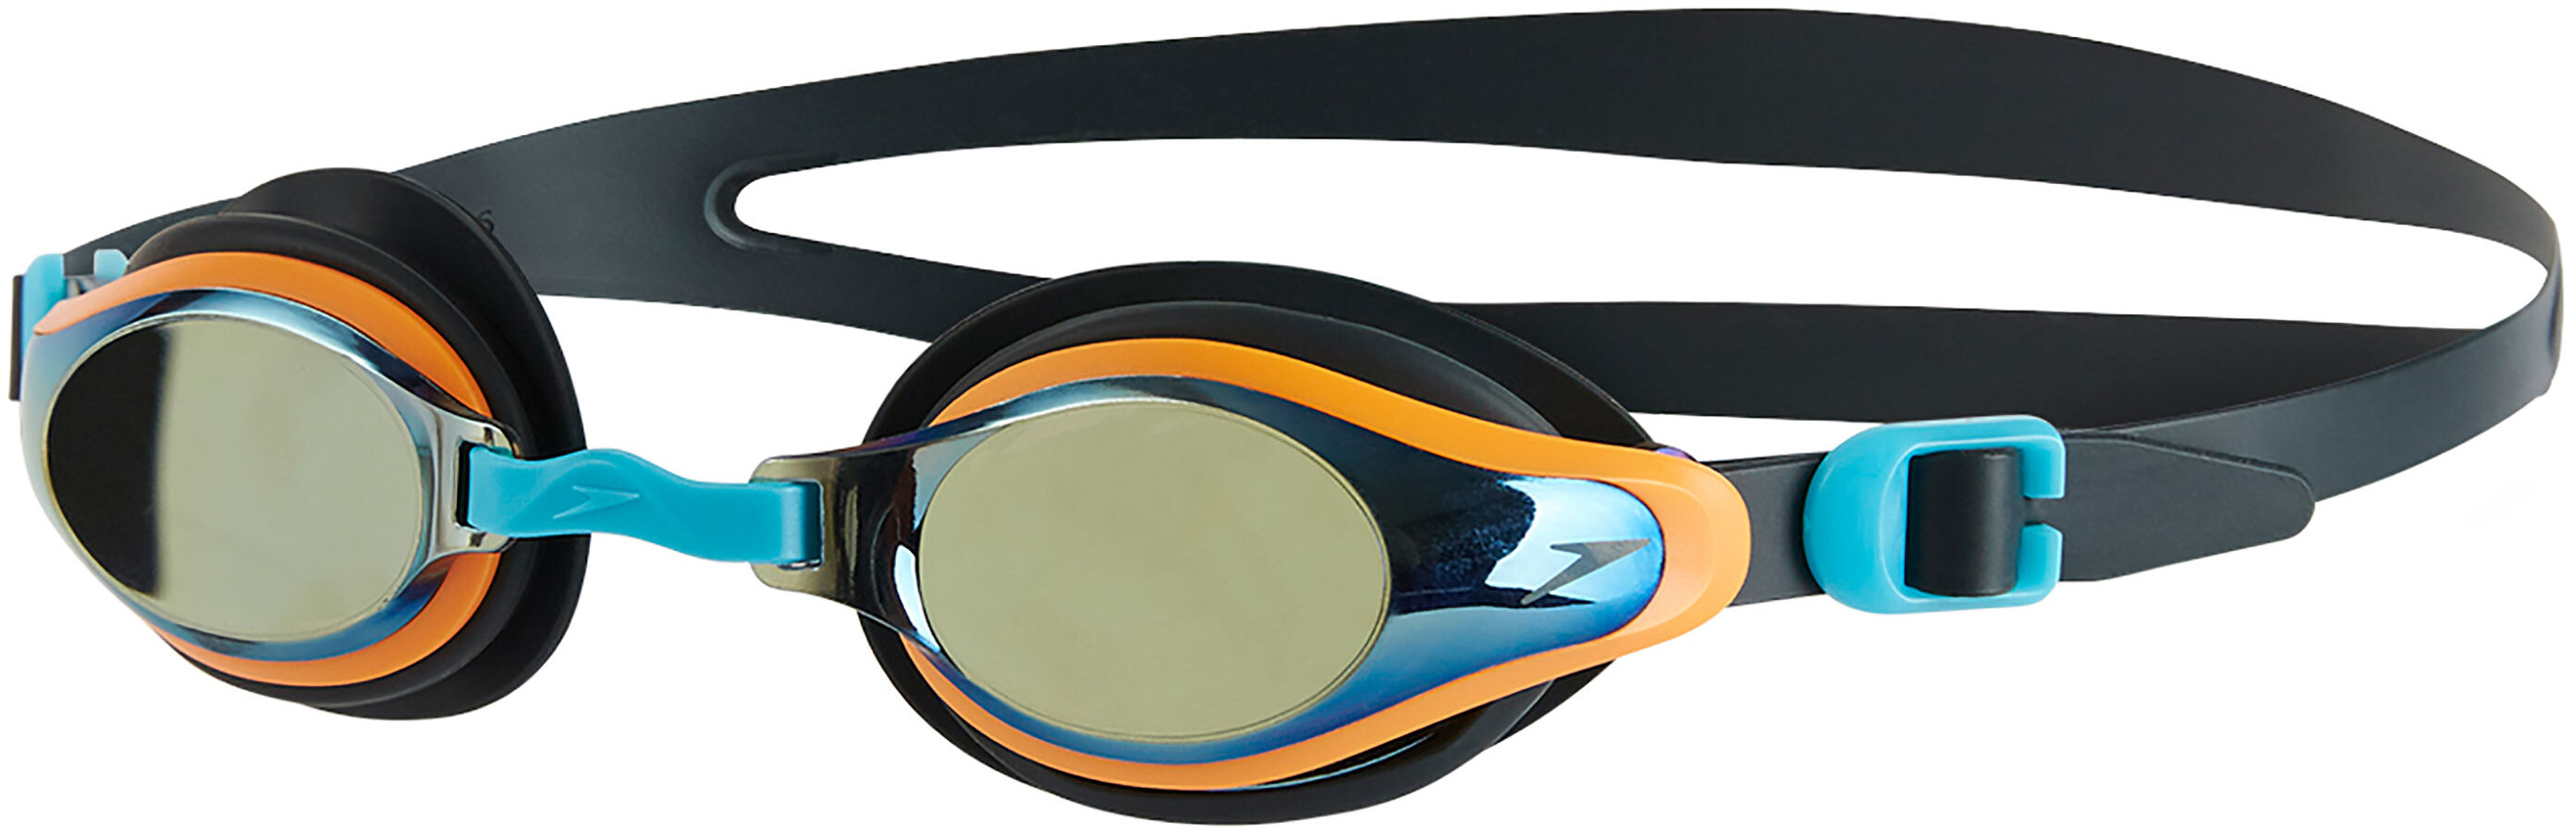 speedo Mariner Supreme Mirror Simglasögon Barn grå orange - till ... cbeefb3455898